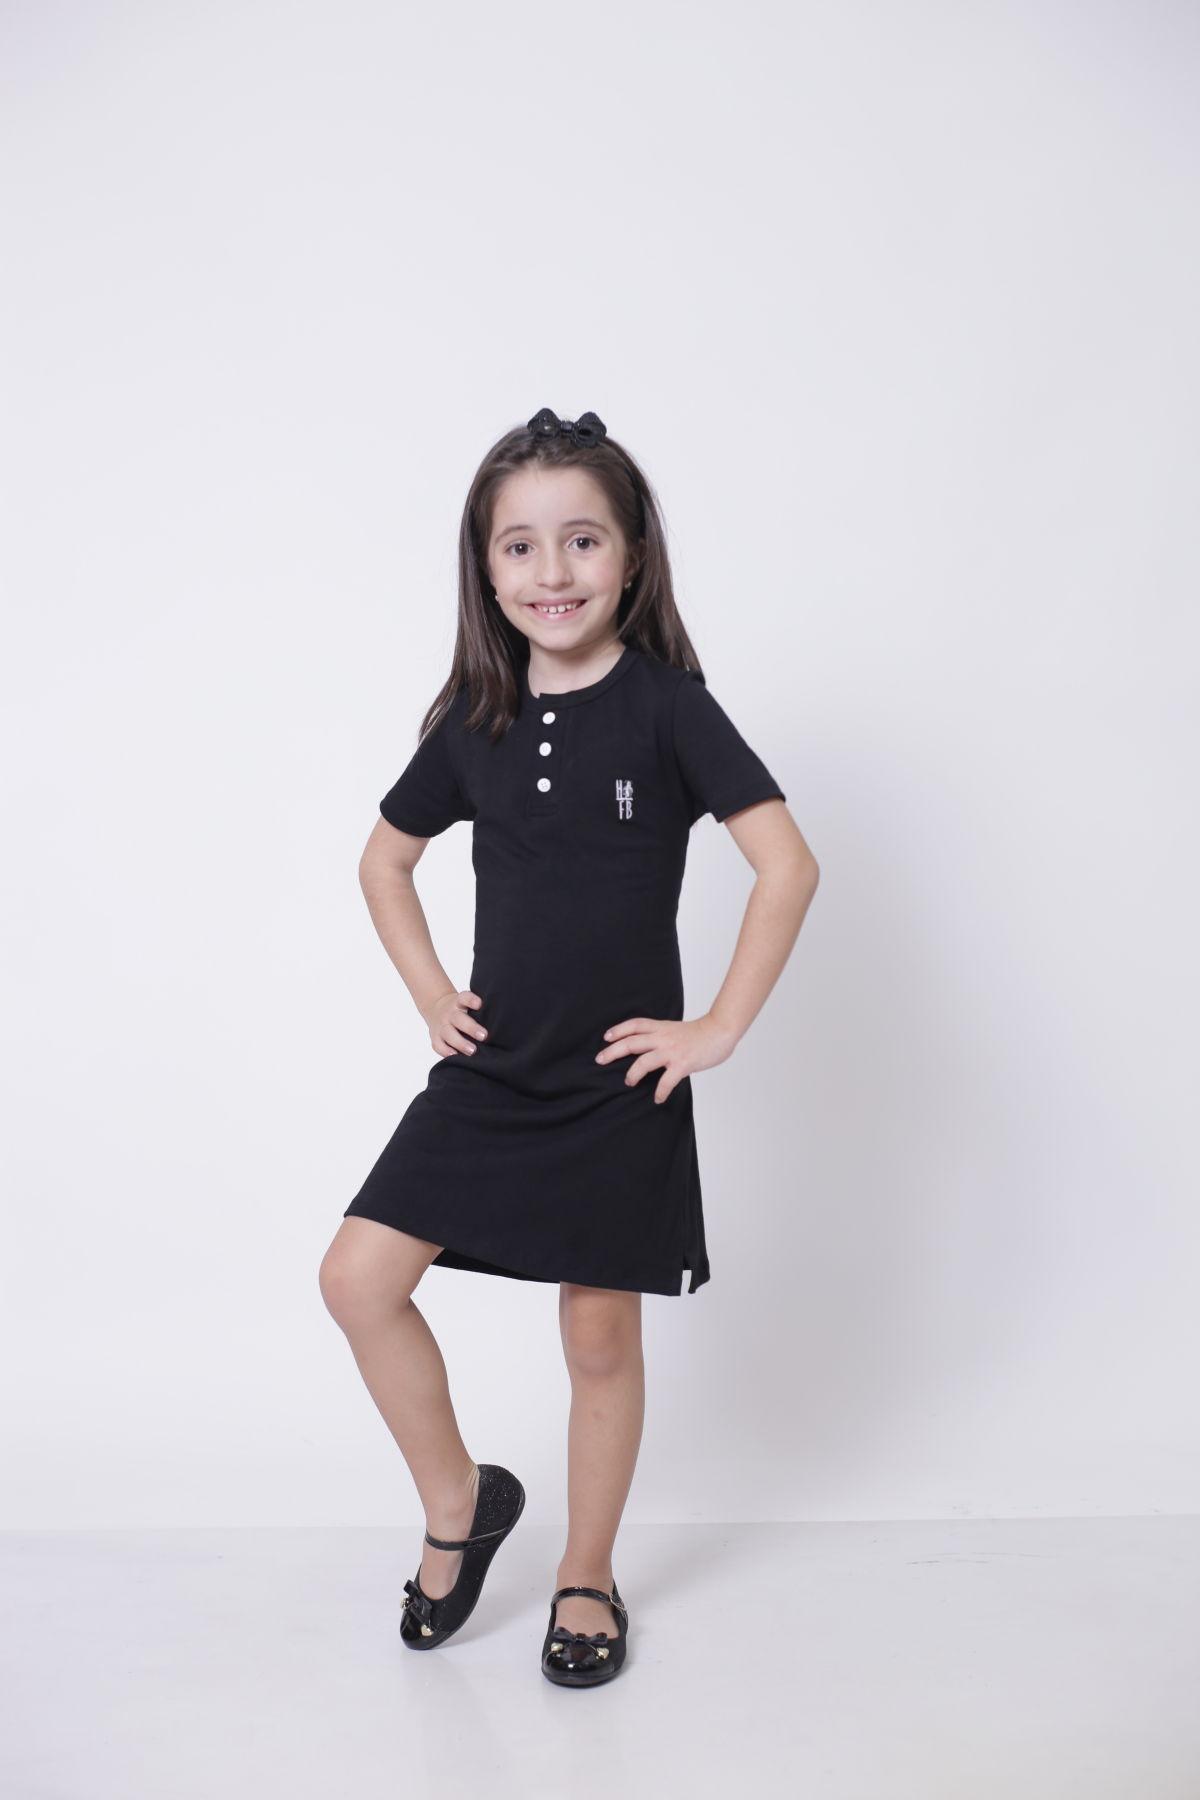 Vestido Henley Infantil Preto  - Heitor Fashion Brazil